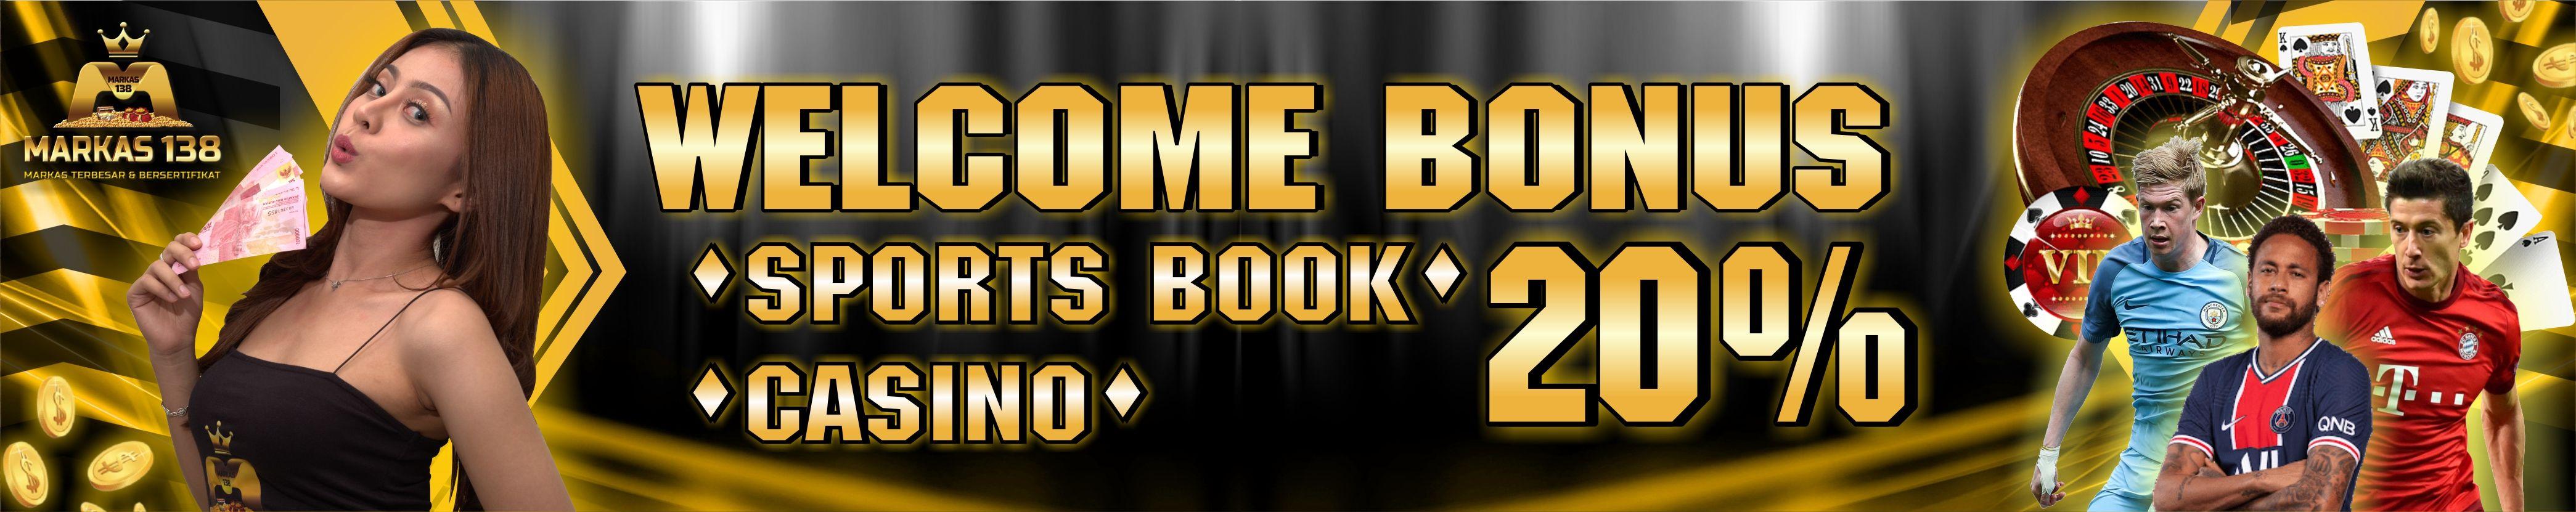 Welcome Bonus 20% Casino Sportsbook